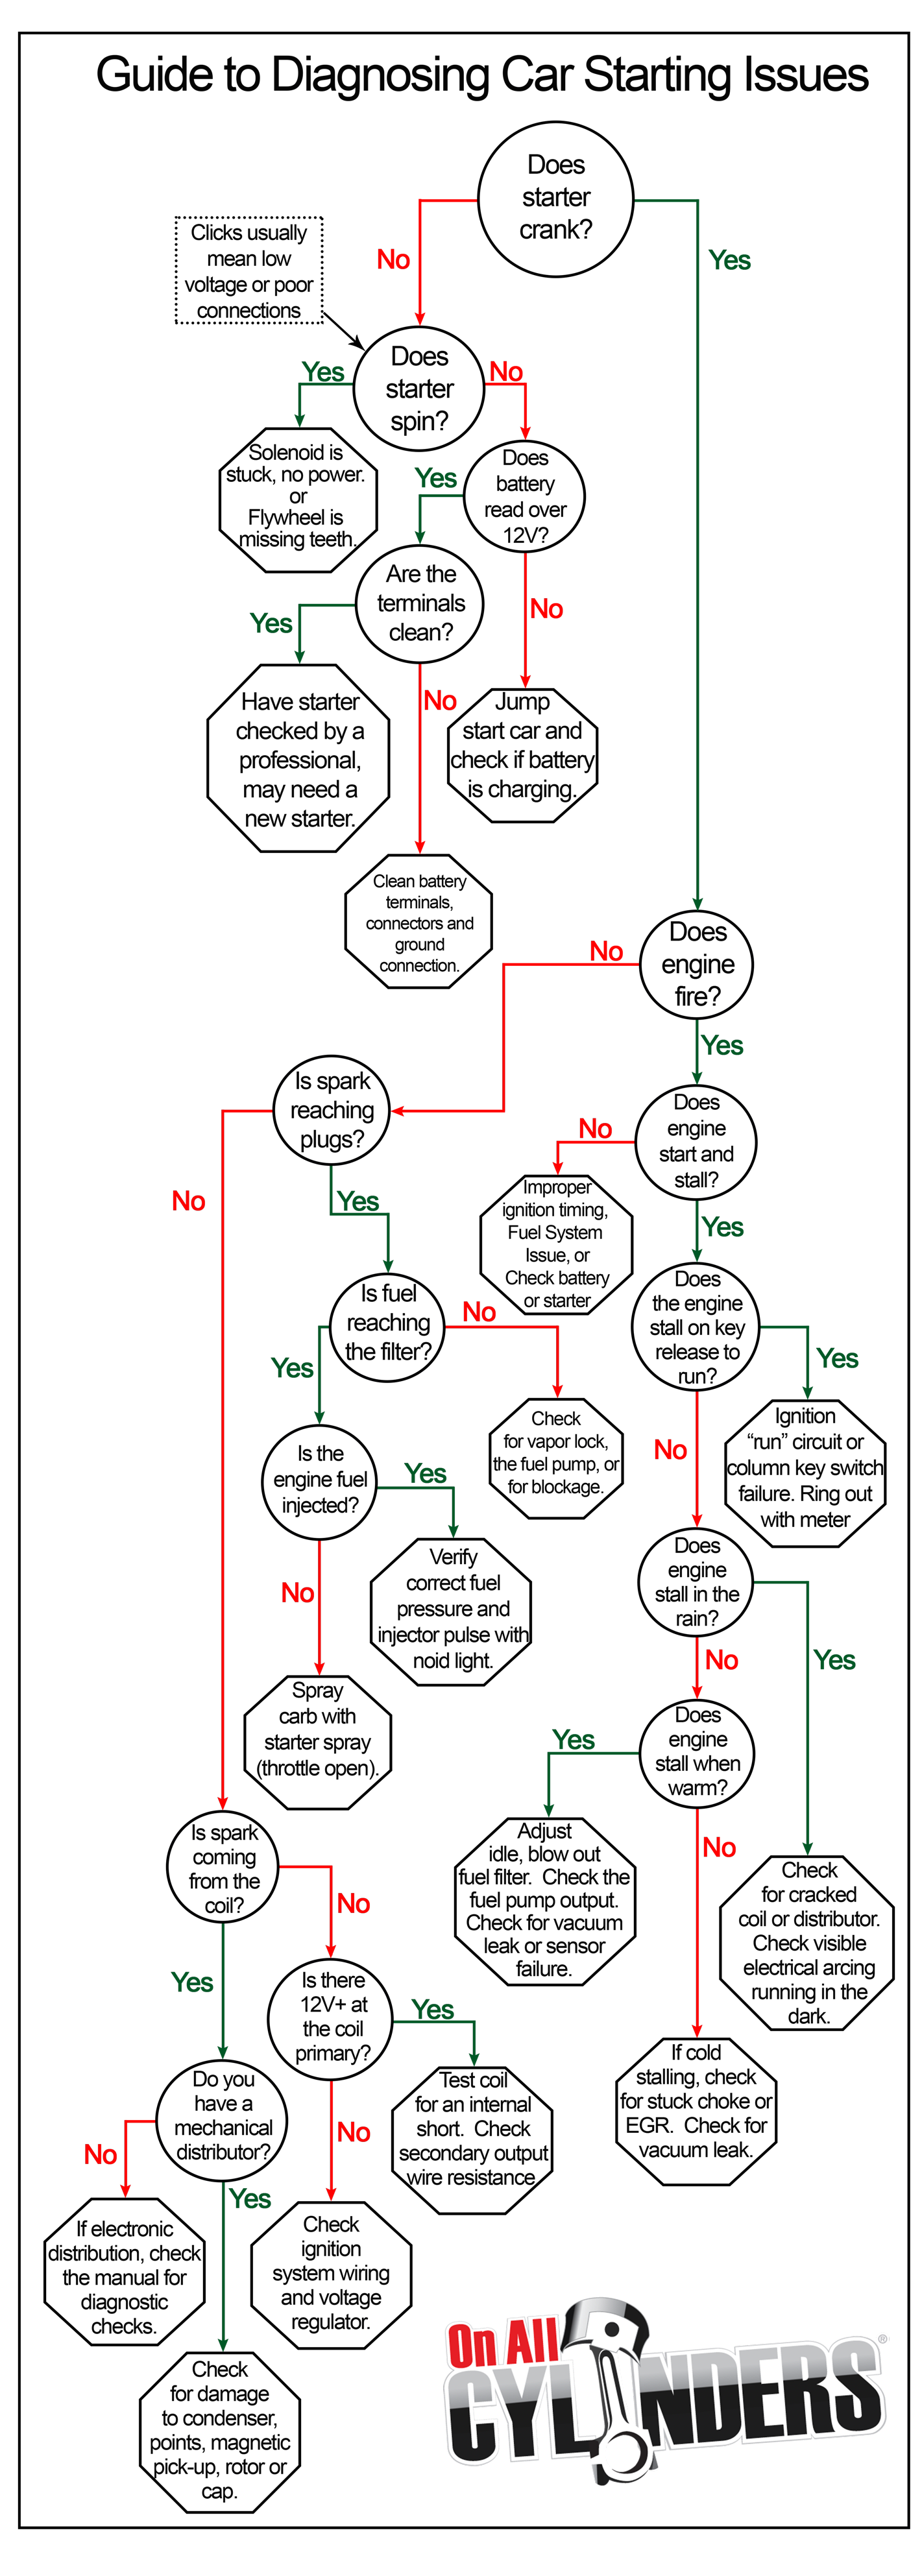 Car Maintenance Check Diagram - Wiring Diagram Filter